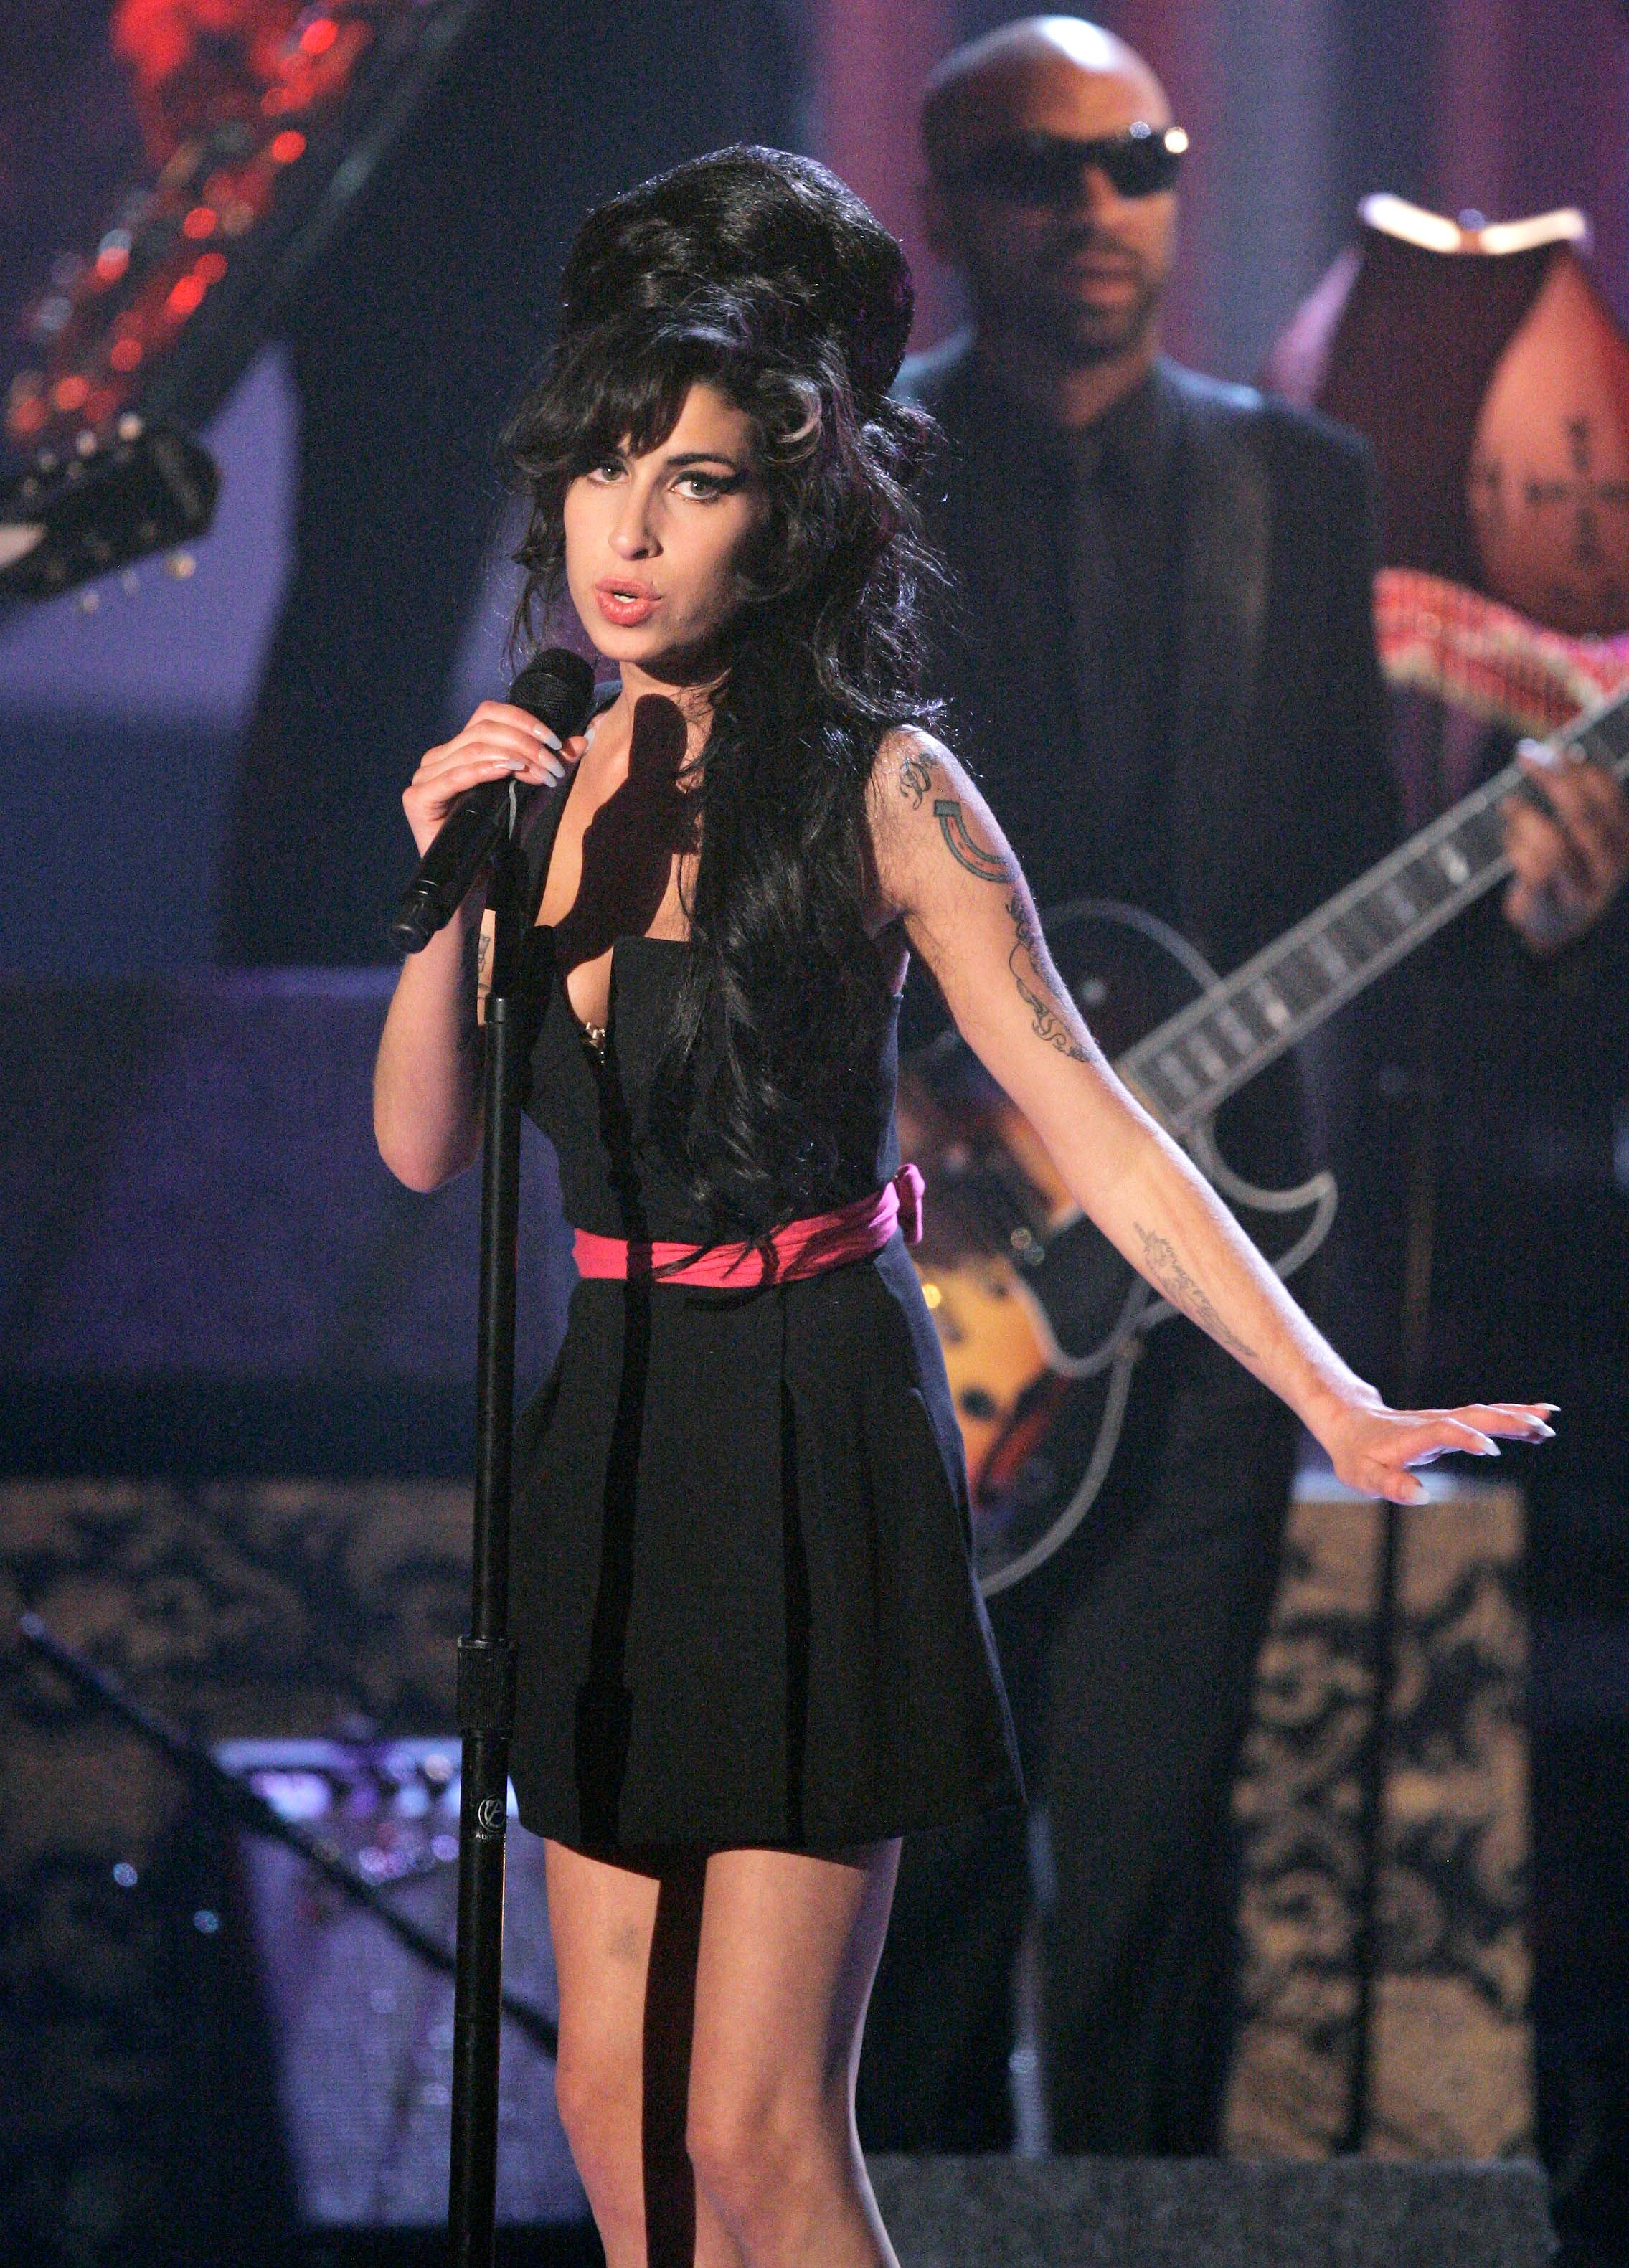 6. Amy Winehouse